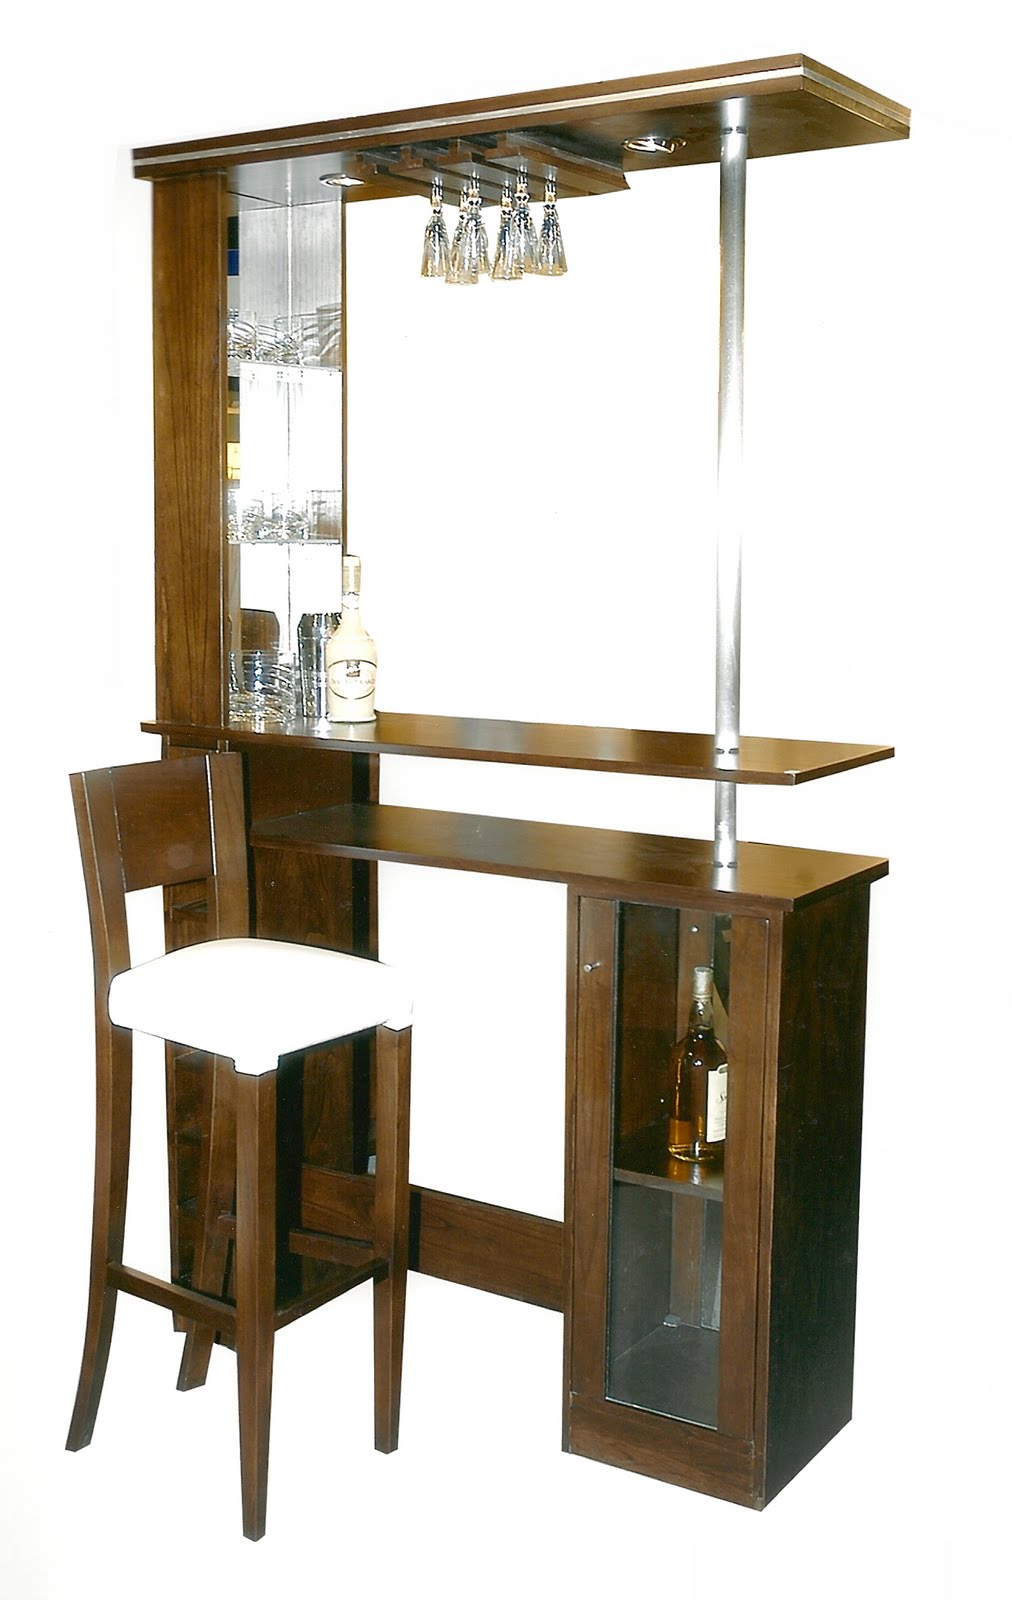 Am interiores muebles modernos country muebles en gral for Muebles modernos df